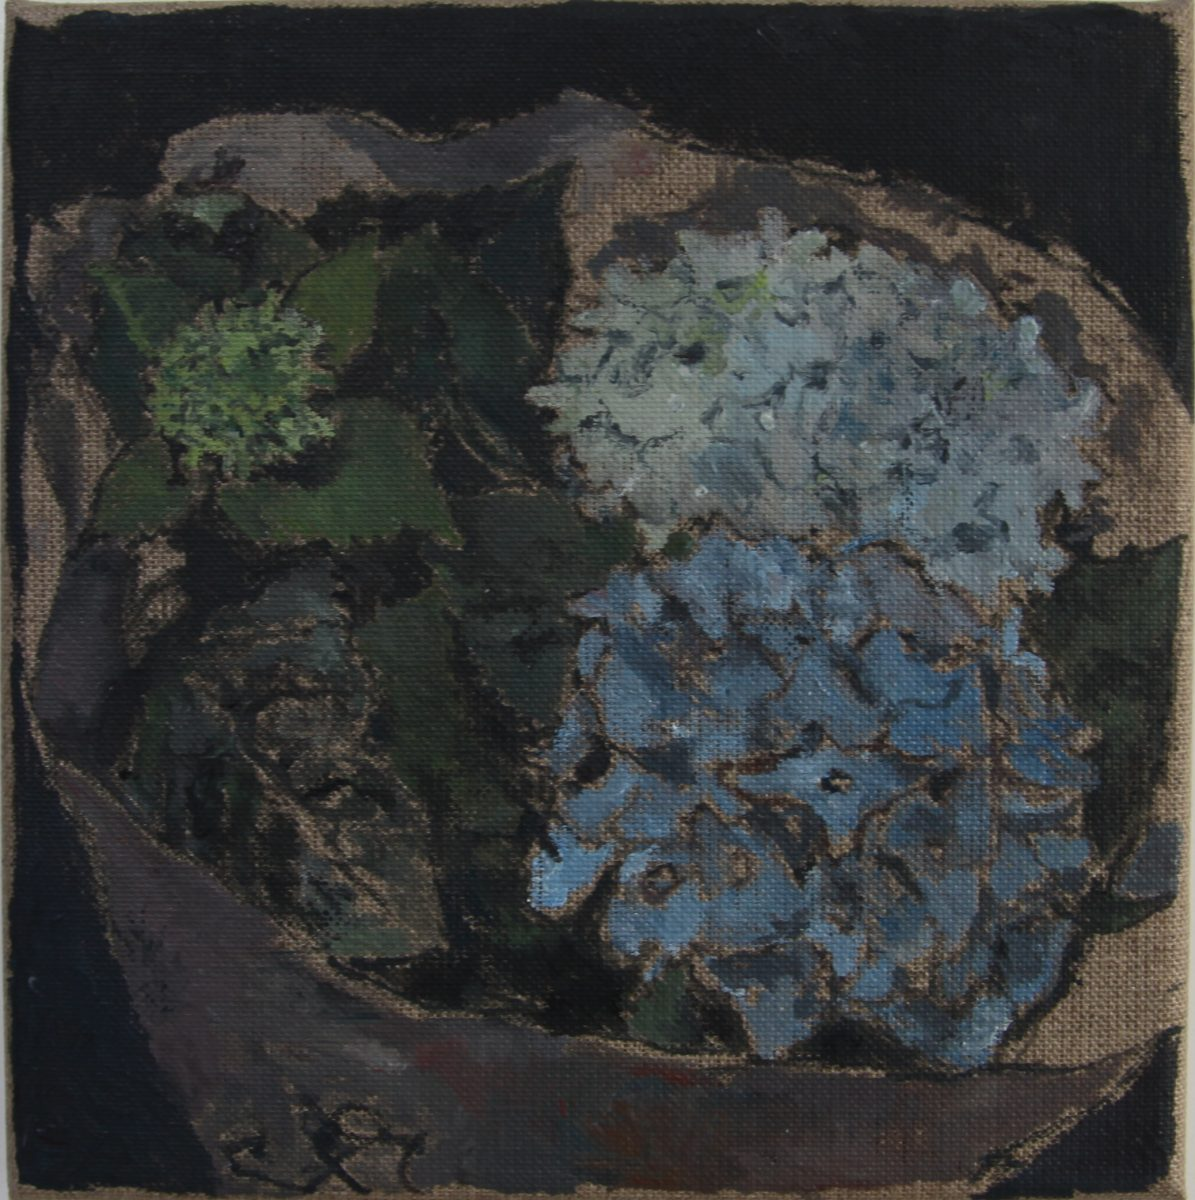 Hortensien 3, 2021, 20 x 20 cm